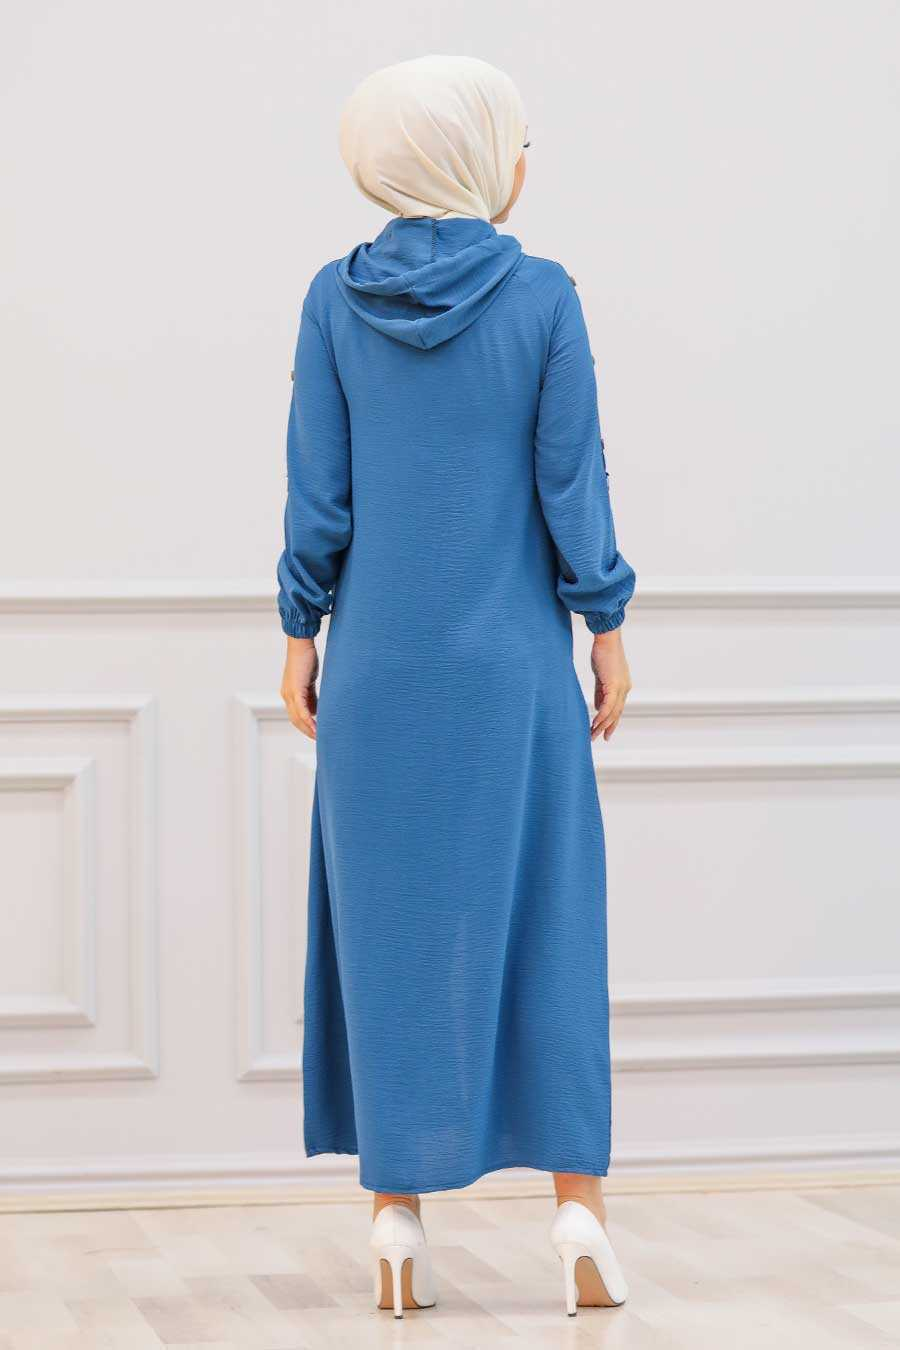 İndigo Blue Hijab Coat 3729IM